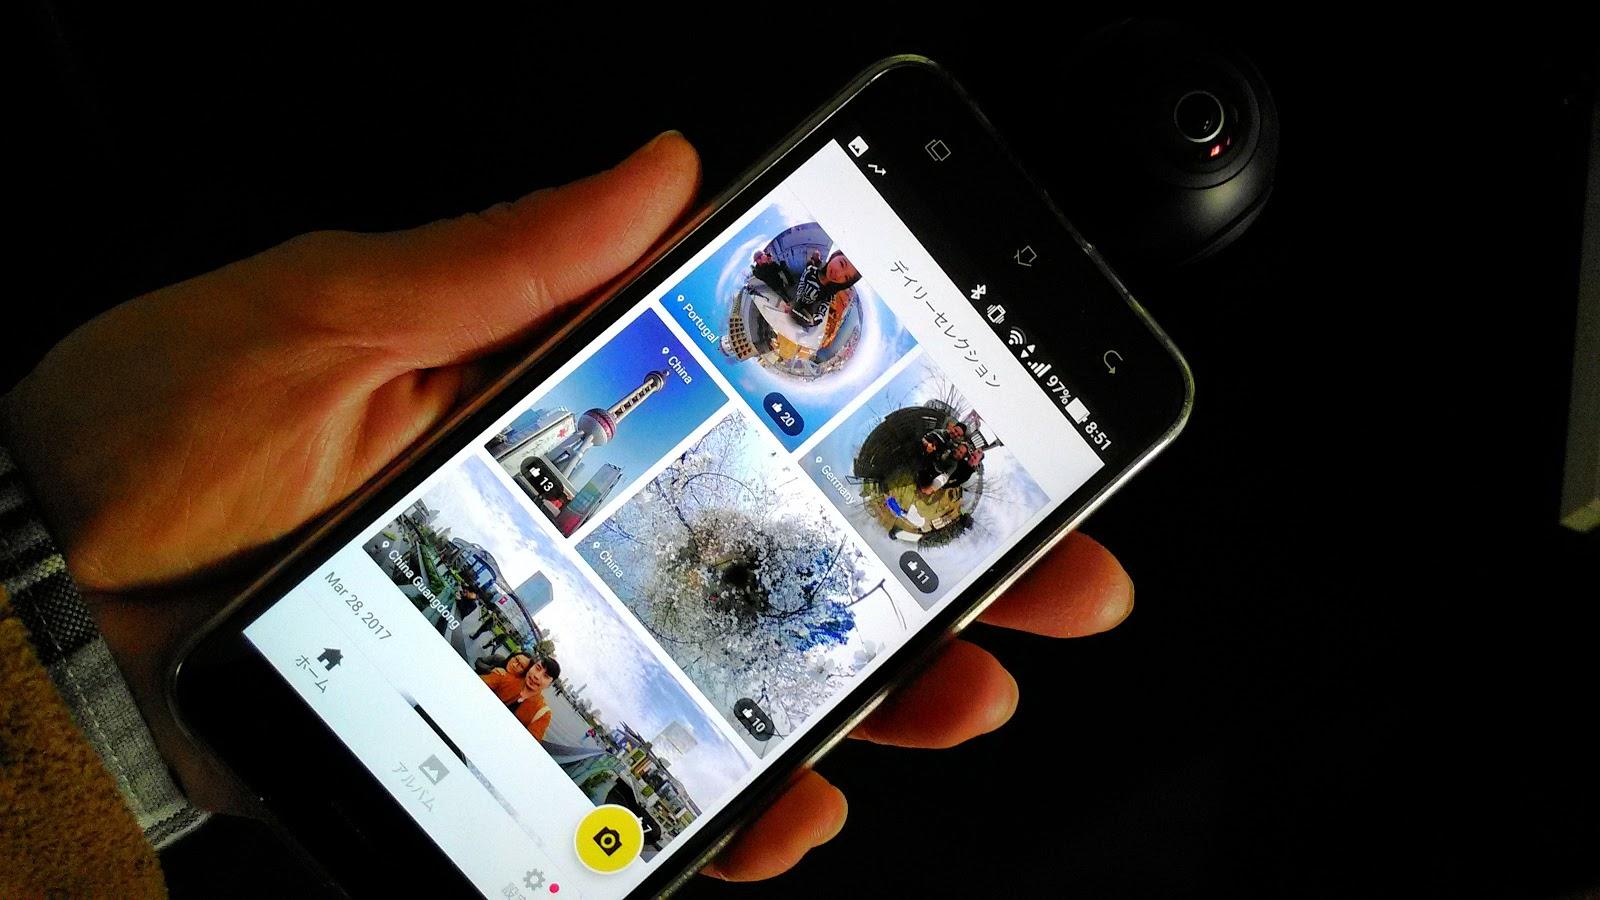 「Insta360 Air」を手に持った写真